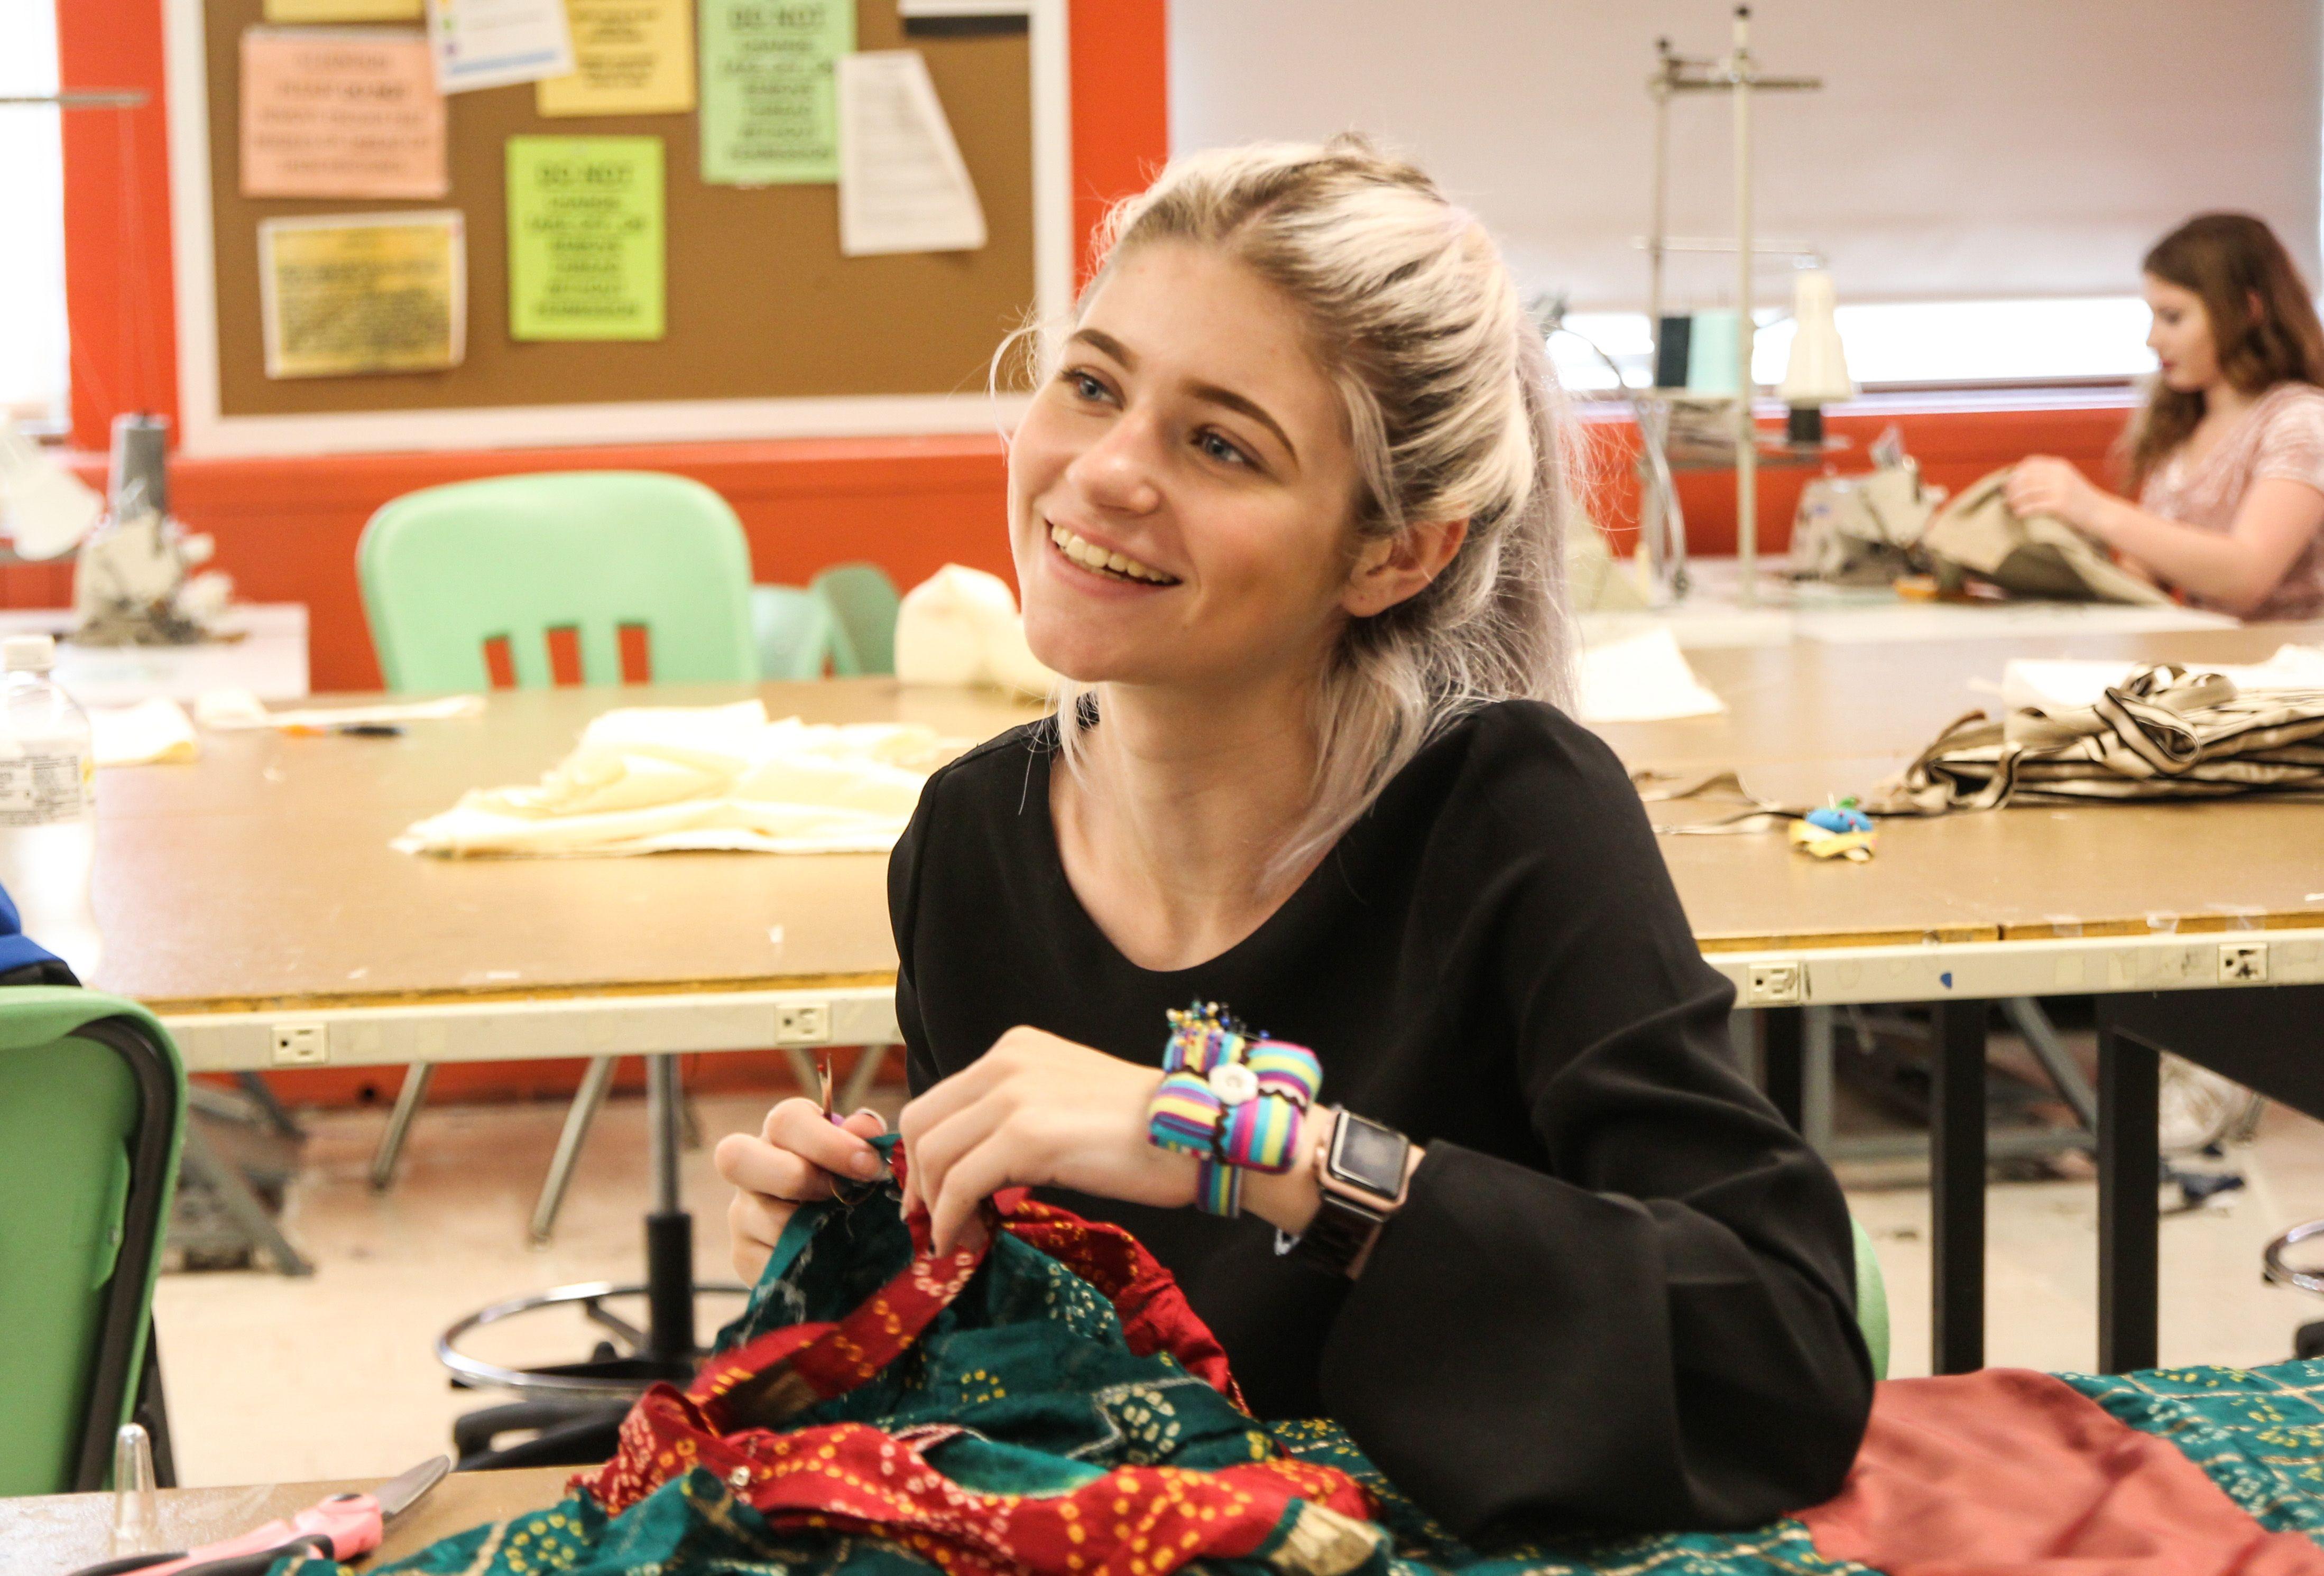 Fashion design for teens in 2020 high school programs